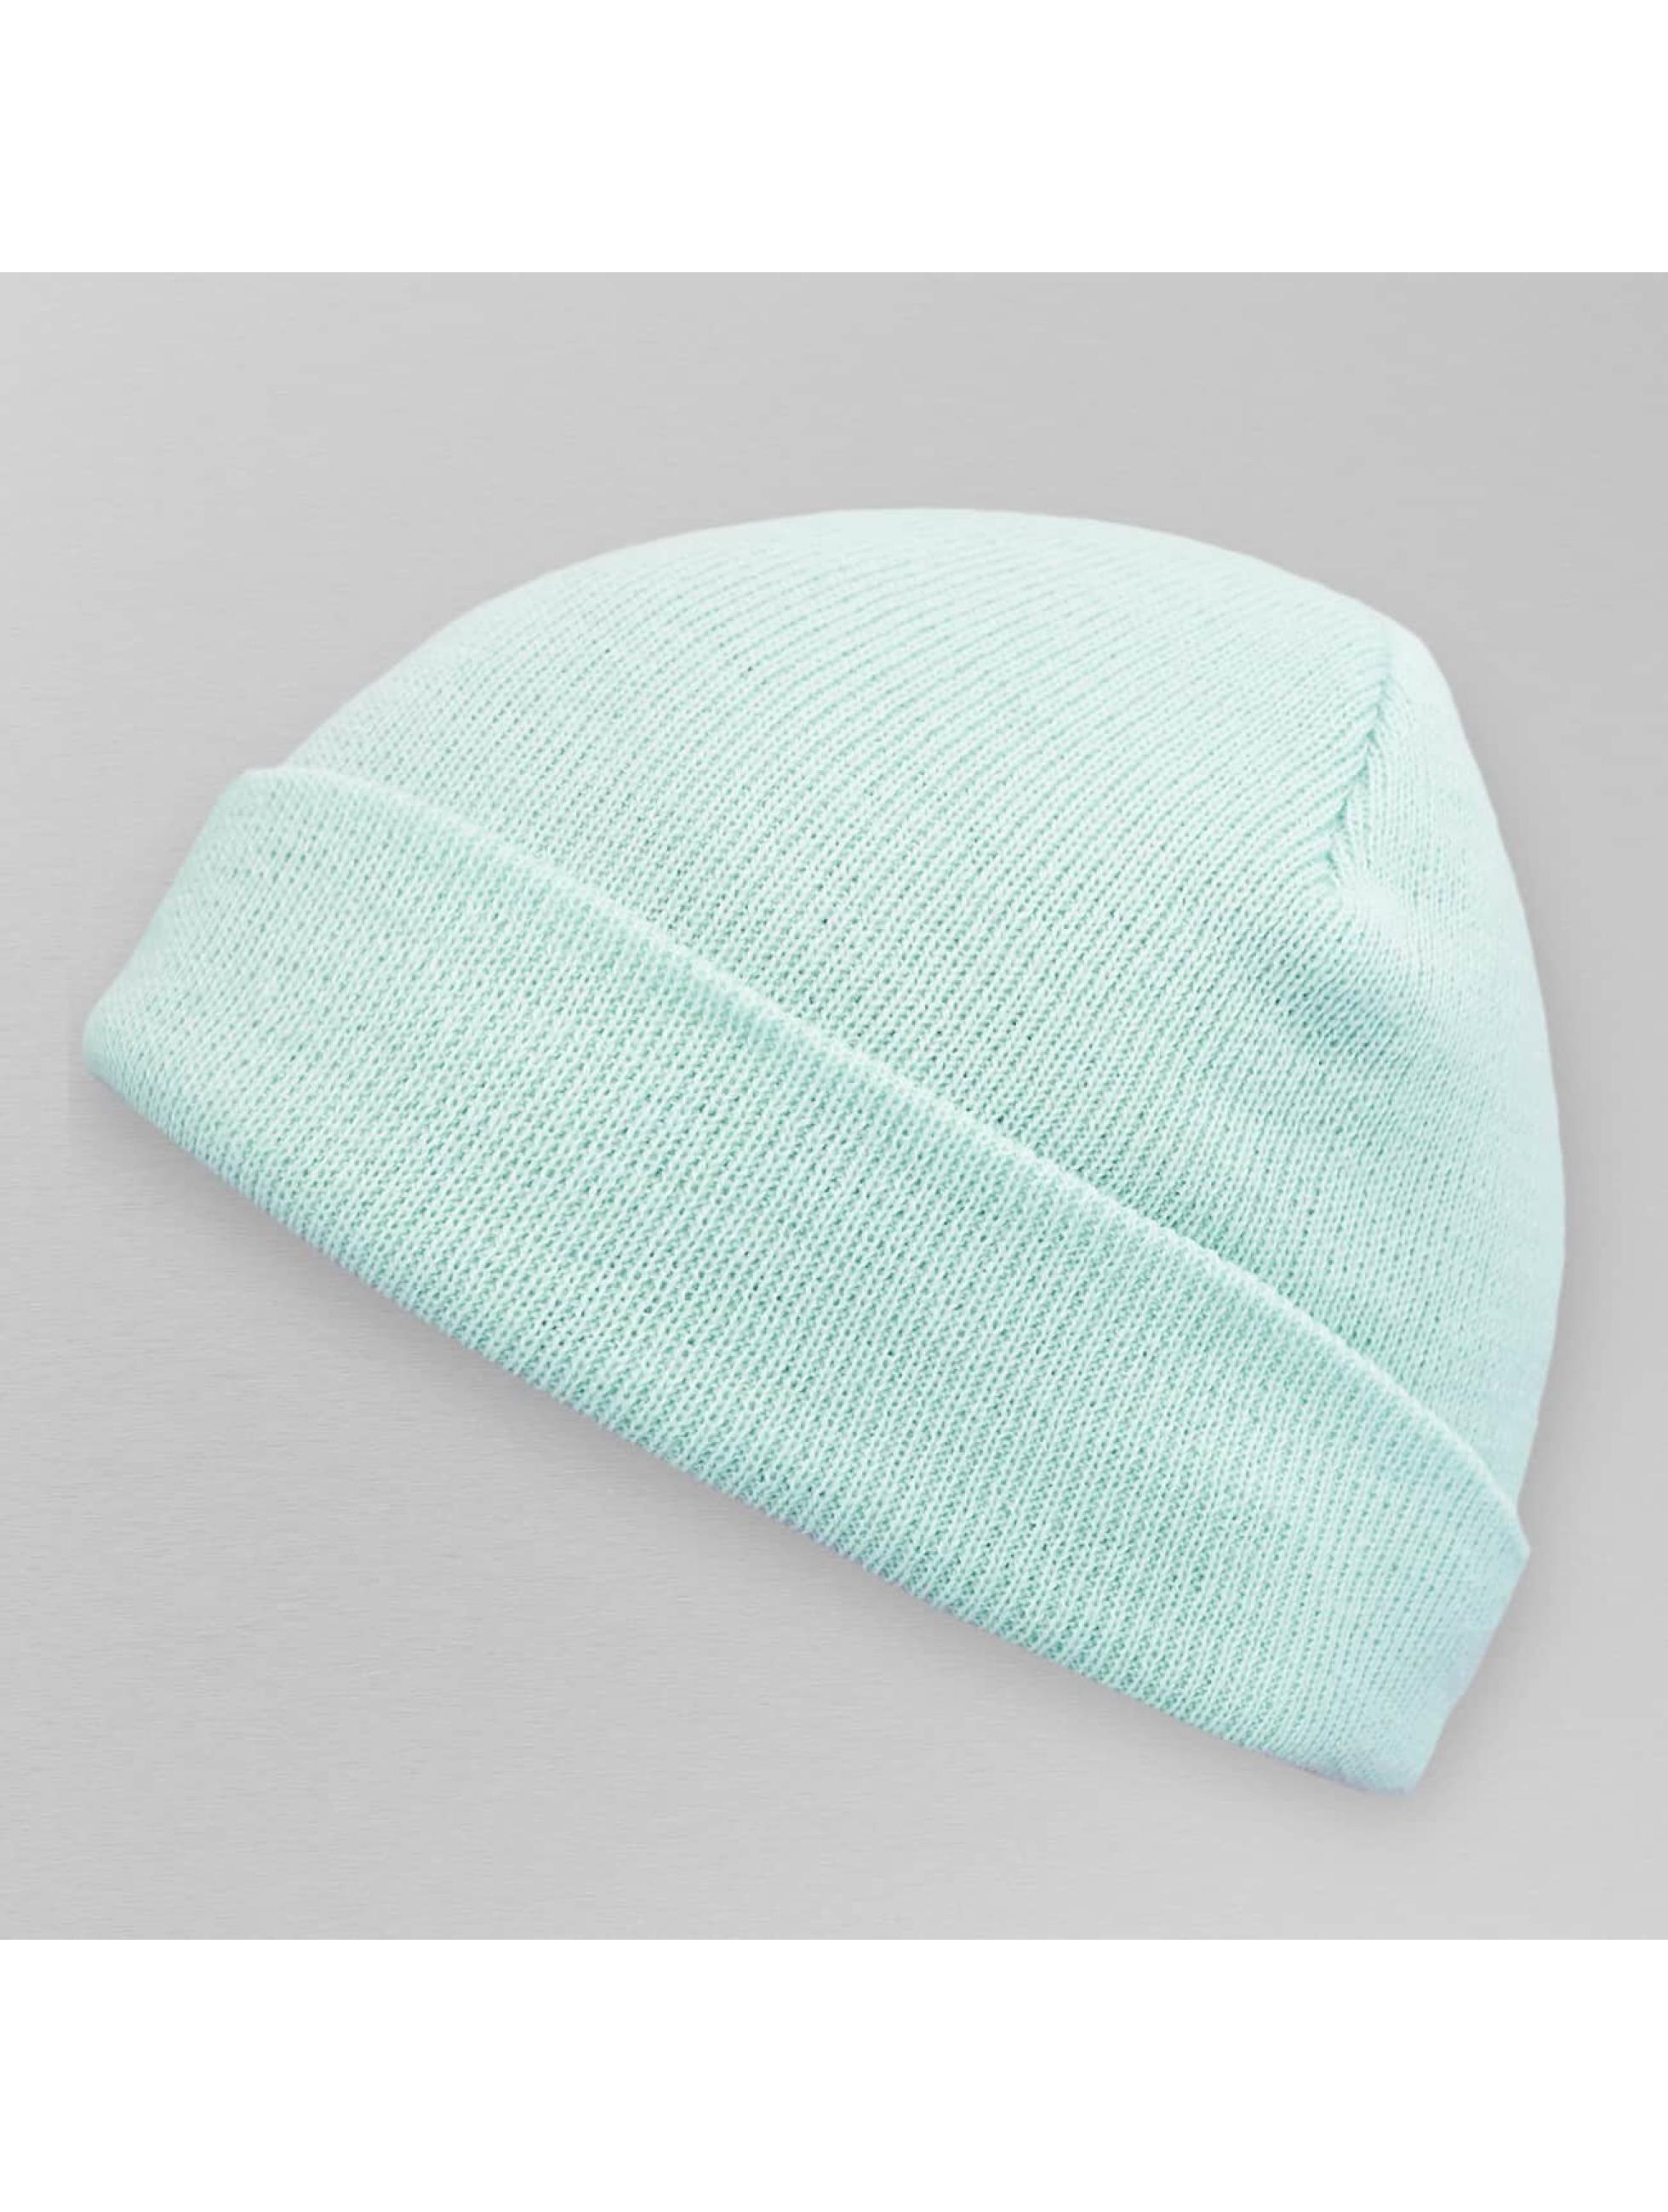 MSTRDS Männer,Frauen Beanie Pastel Basic Flap in blau